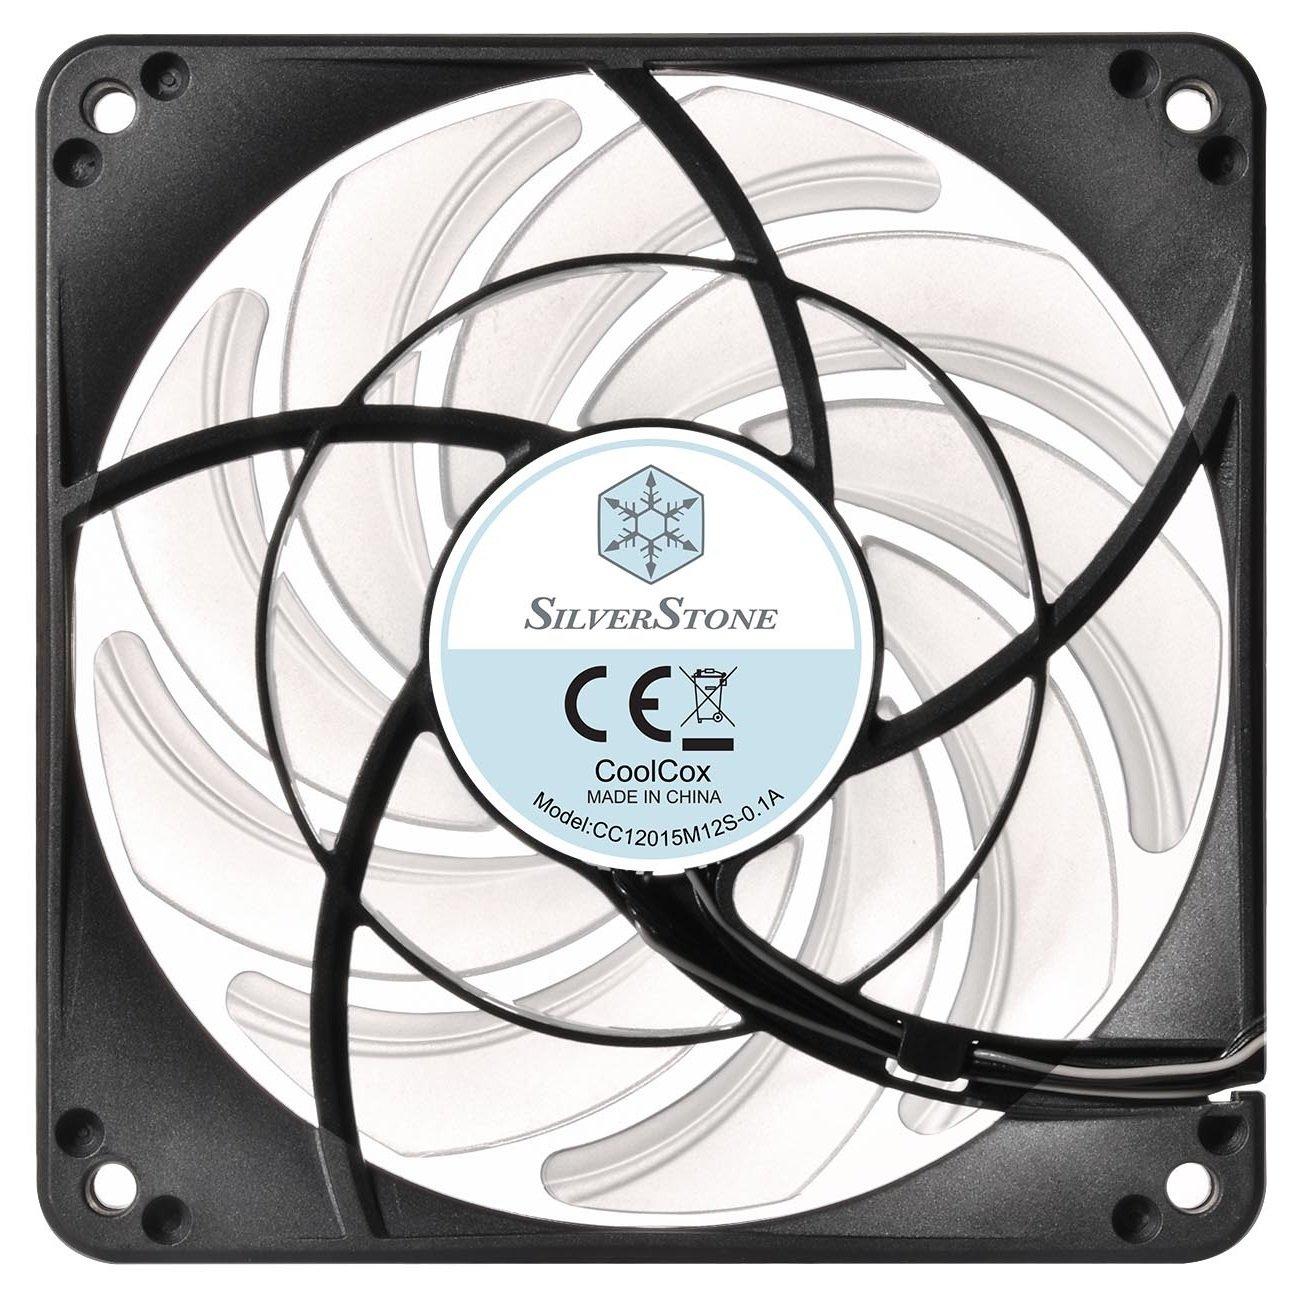 Вентилятор для корпуса Silver Stone FW124-ARGB Quiet Slim (SST-FW124-ARGB) фото